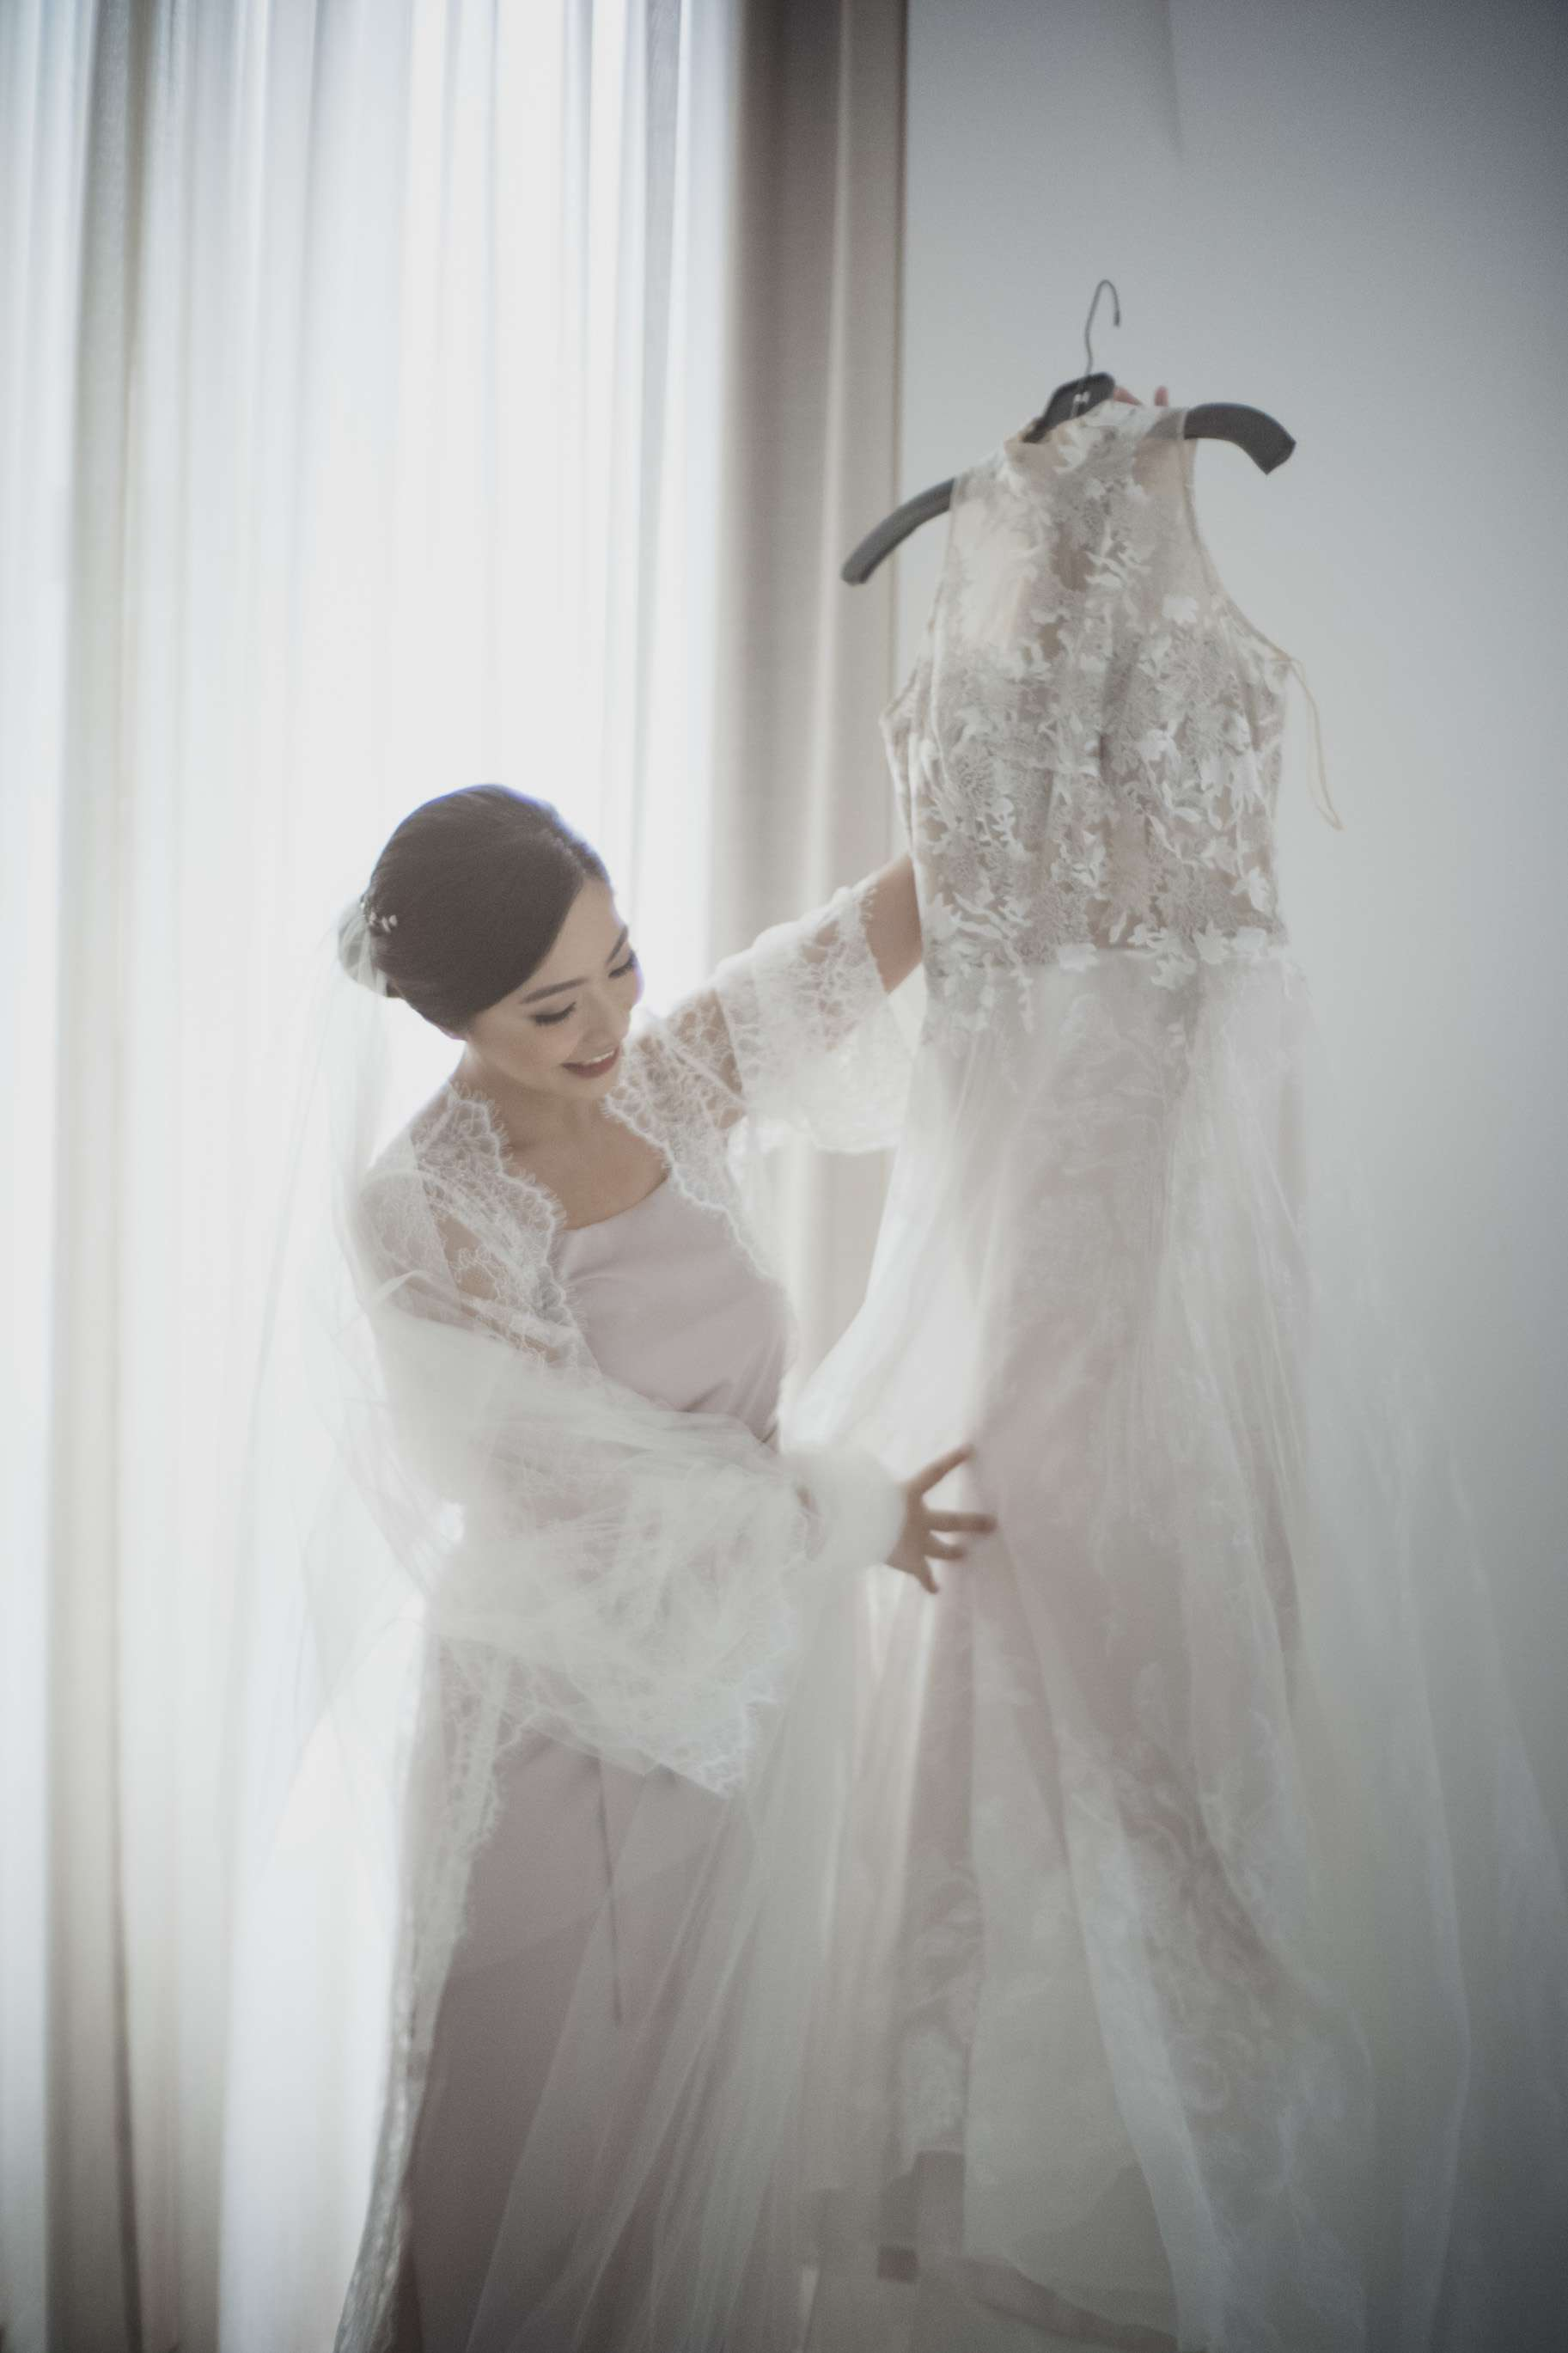 Bride holding up wedding dress